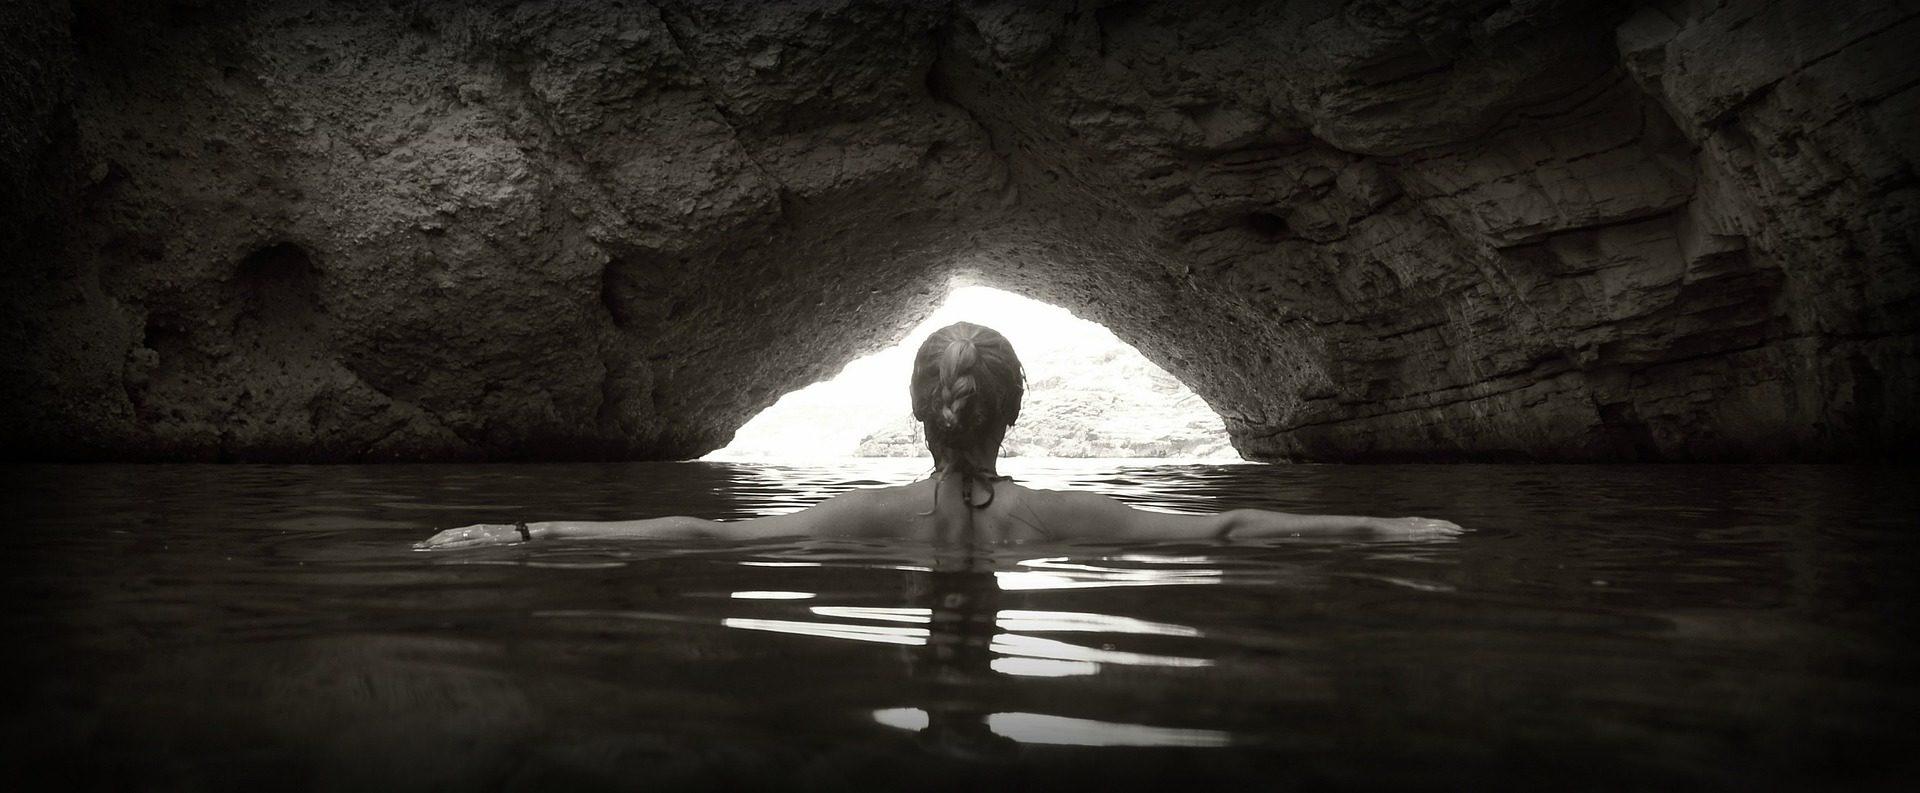 femme, eau, salle de bain, Cueva, creux, lumière, Mer - Fonds d'écran HD - Professor-falken.com